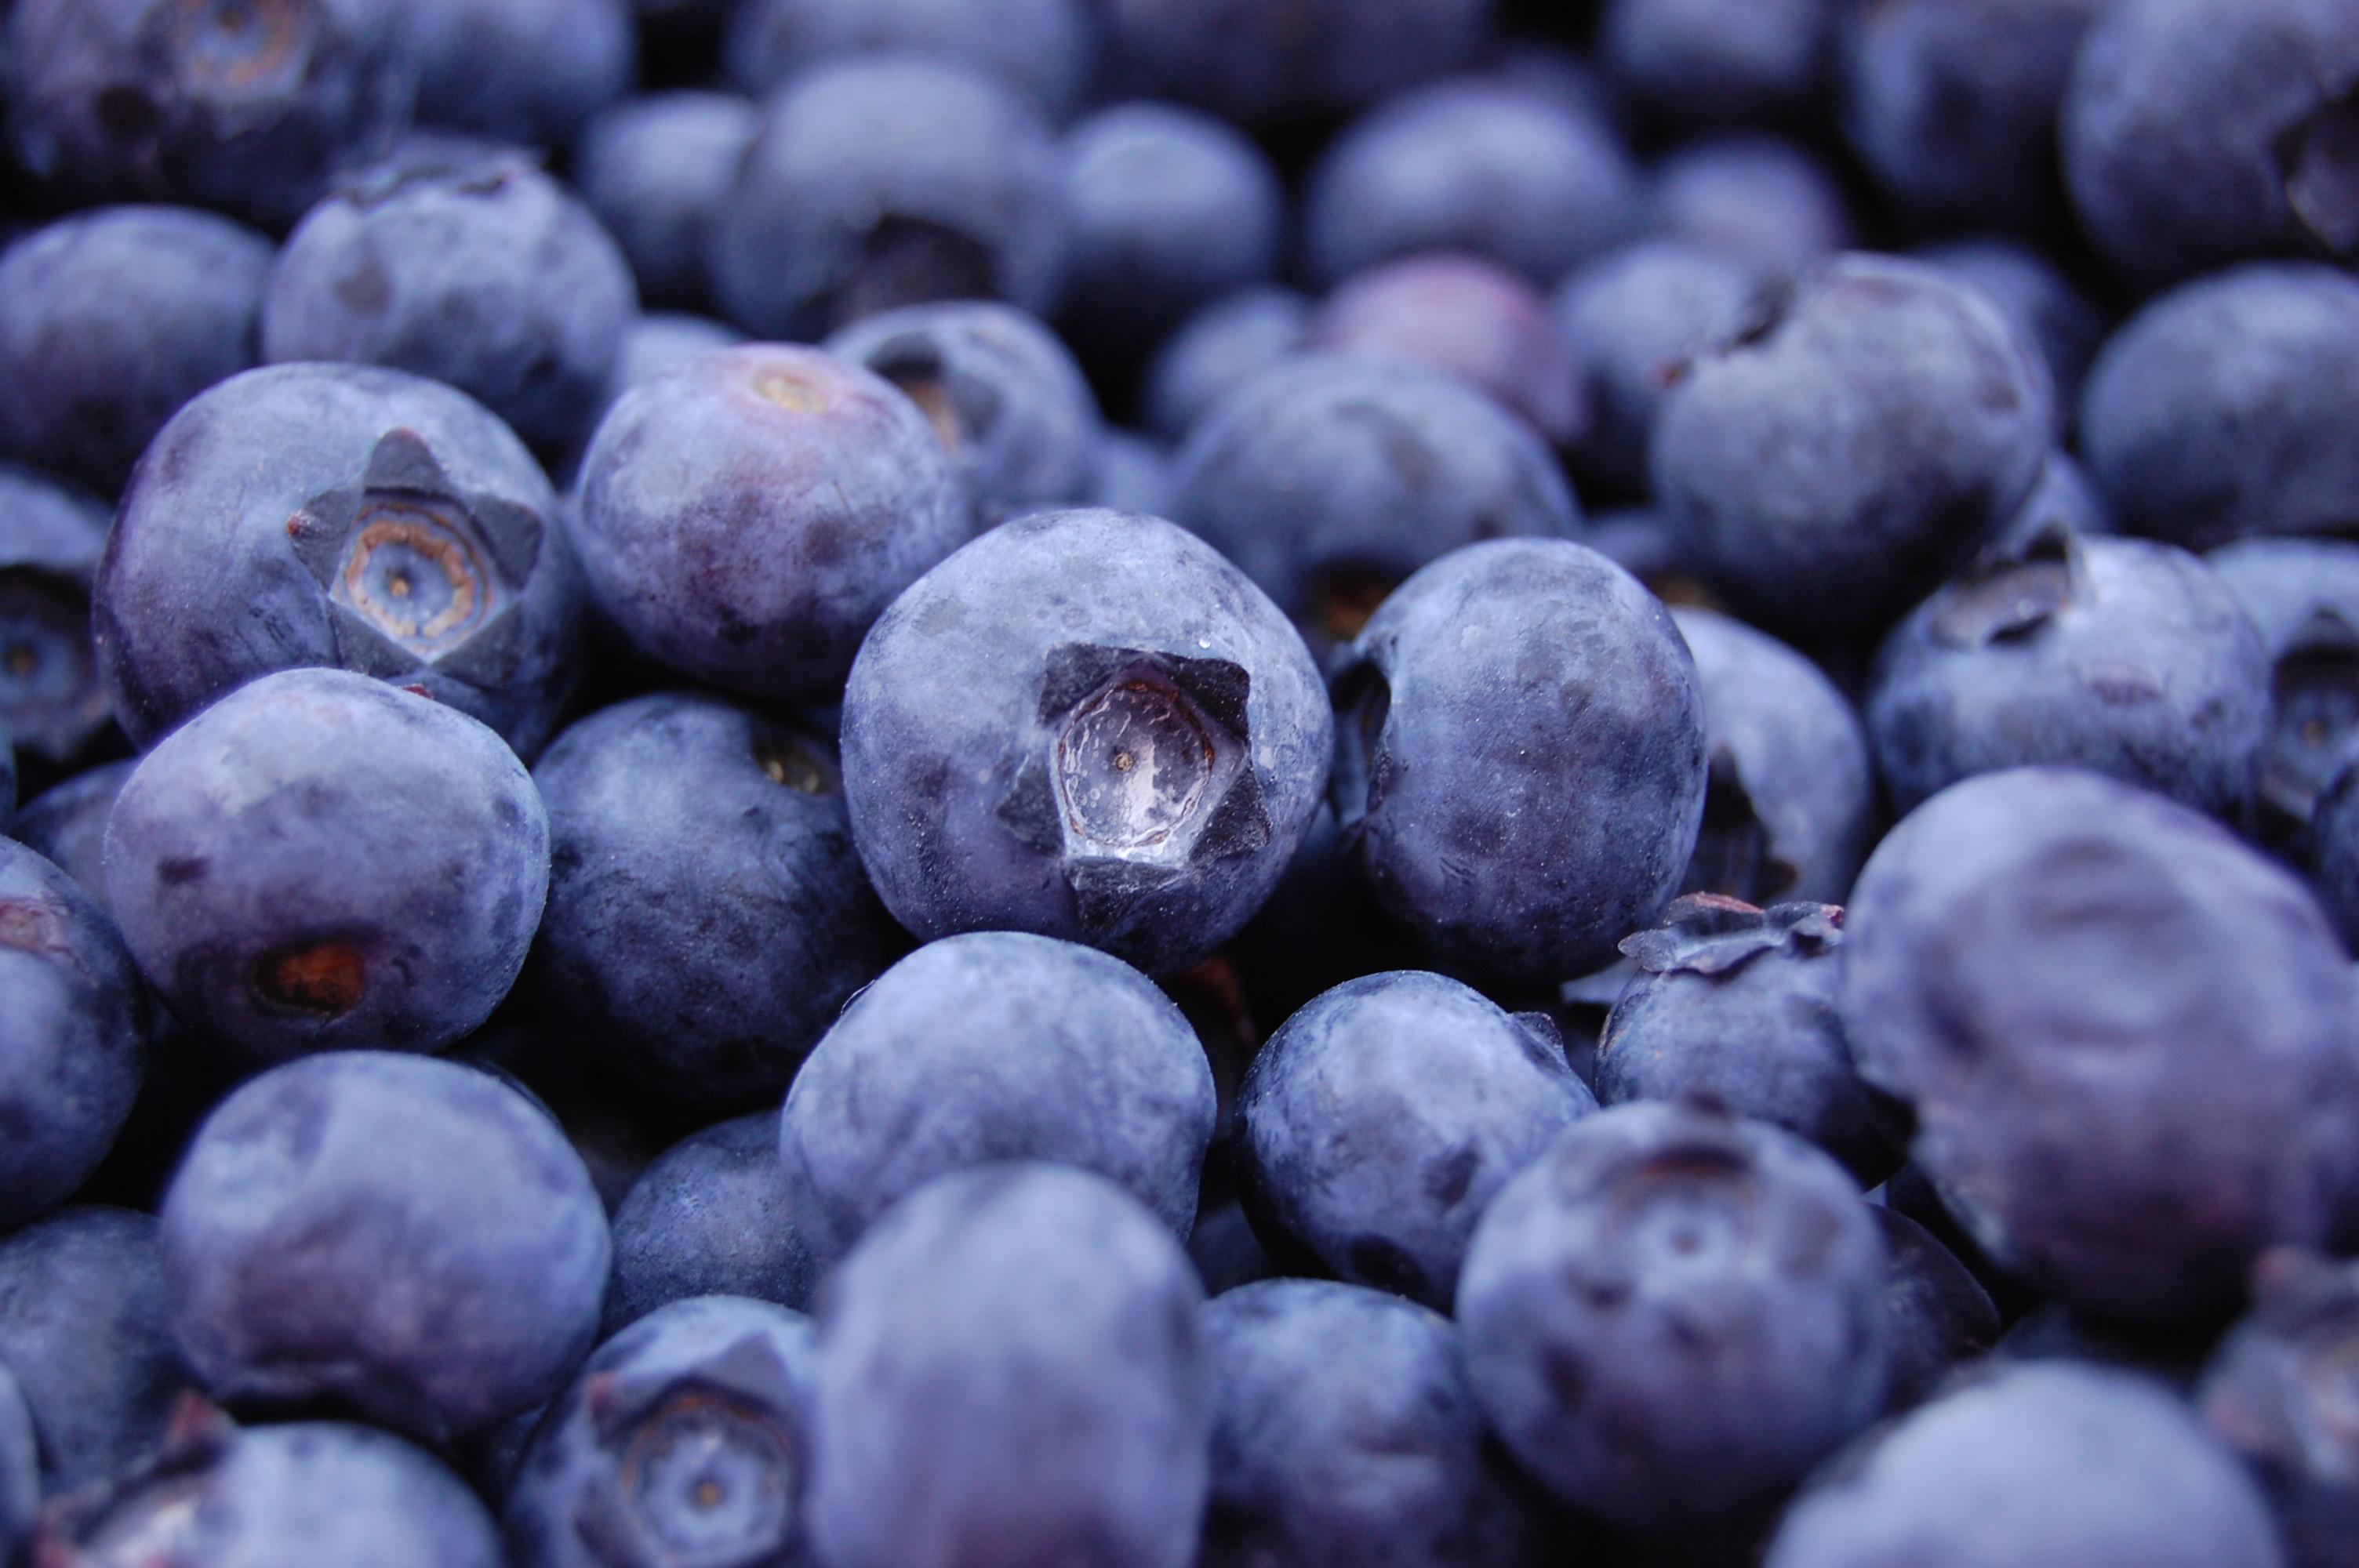 10 Proven Health Benefits of Blueberries